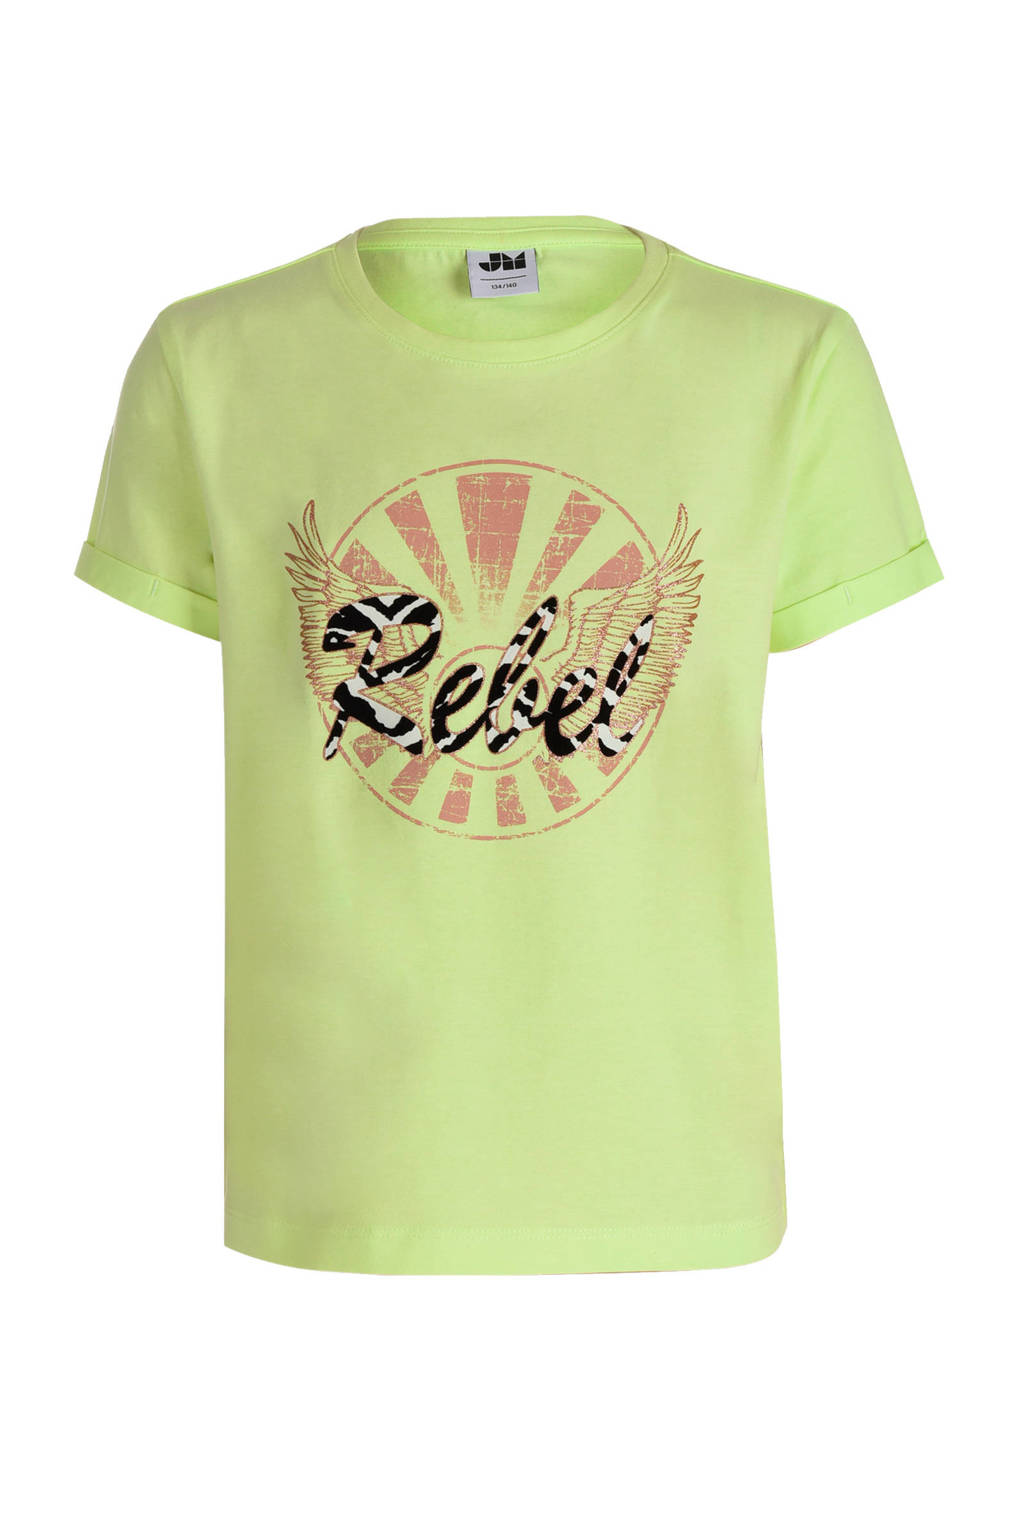 Jill T-shirt Tirsa met printopdruk geel, Geel